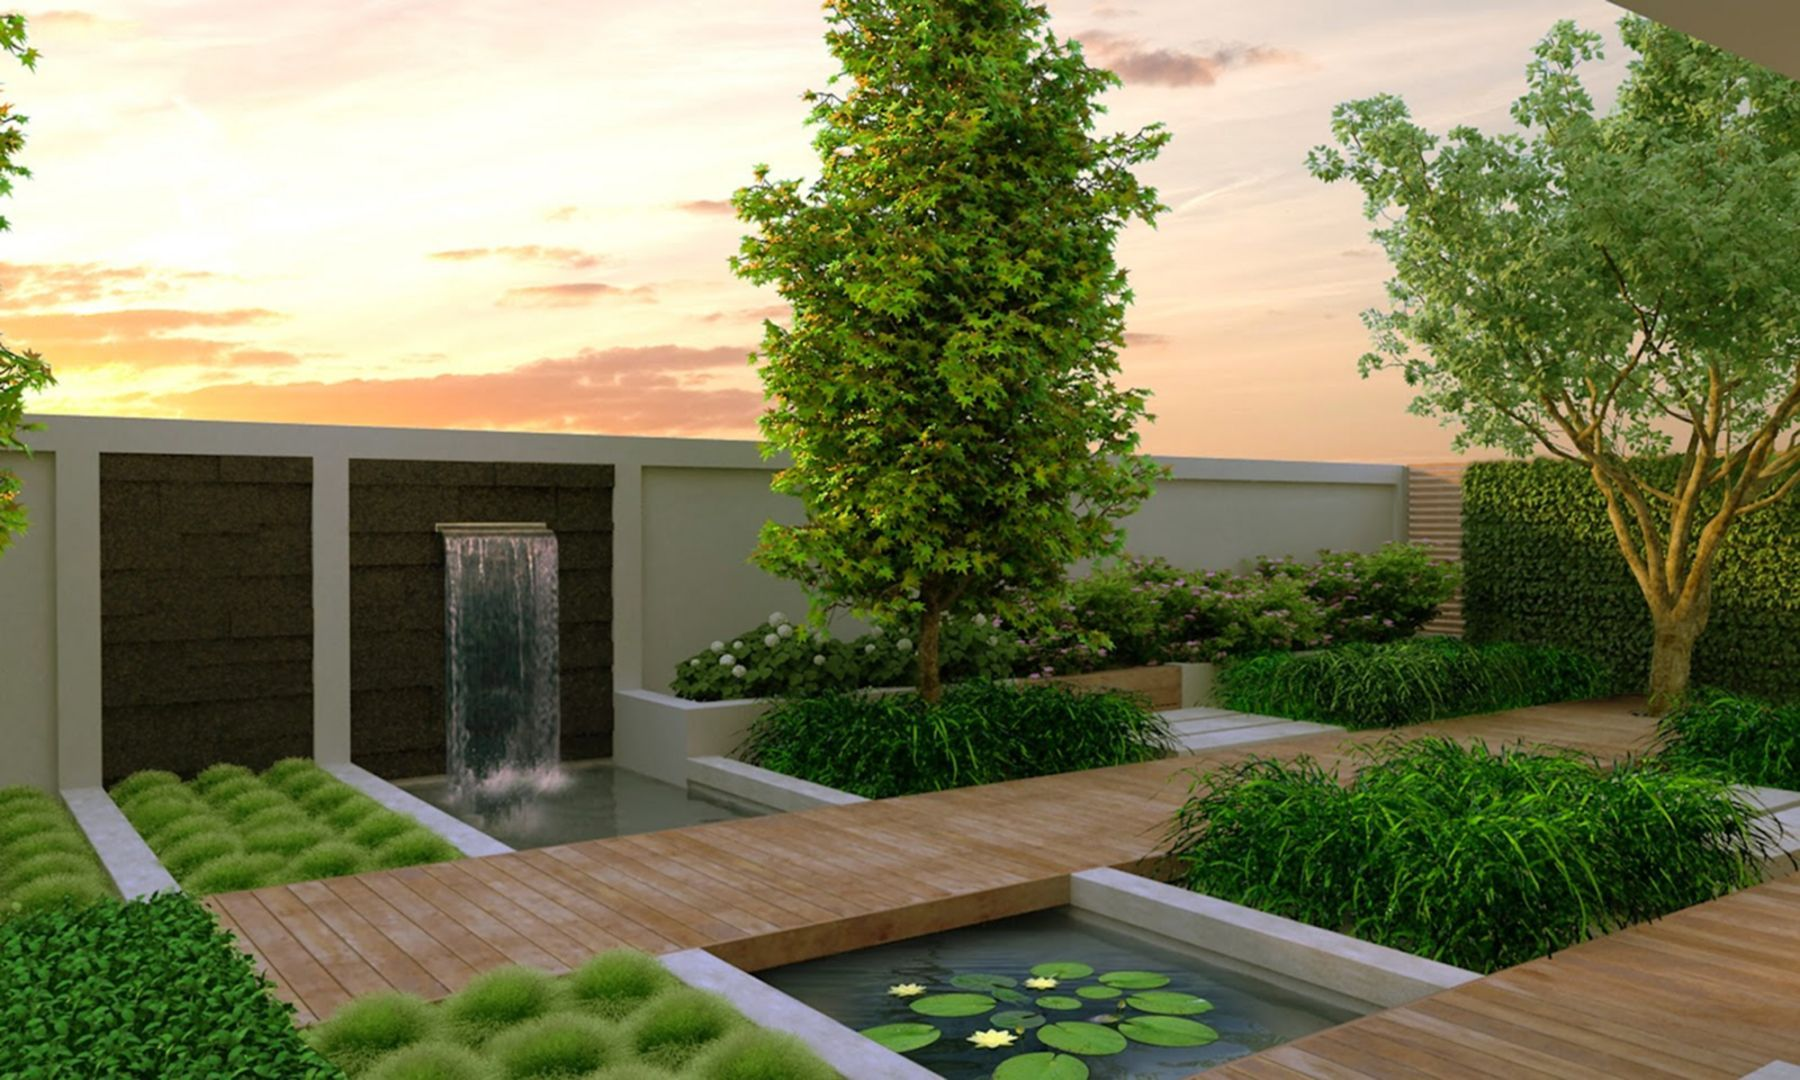 8 Cozy Contemporary Landscape Design Ideas That Will Make Your